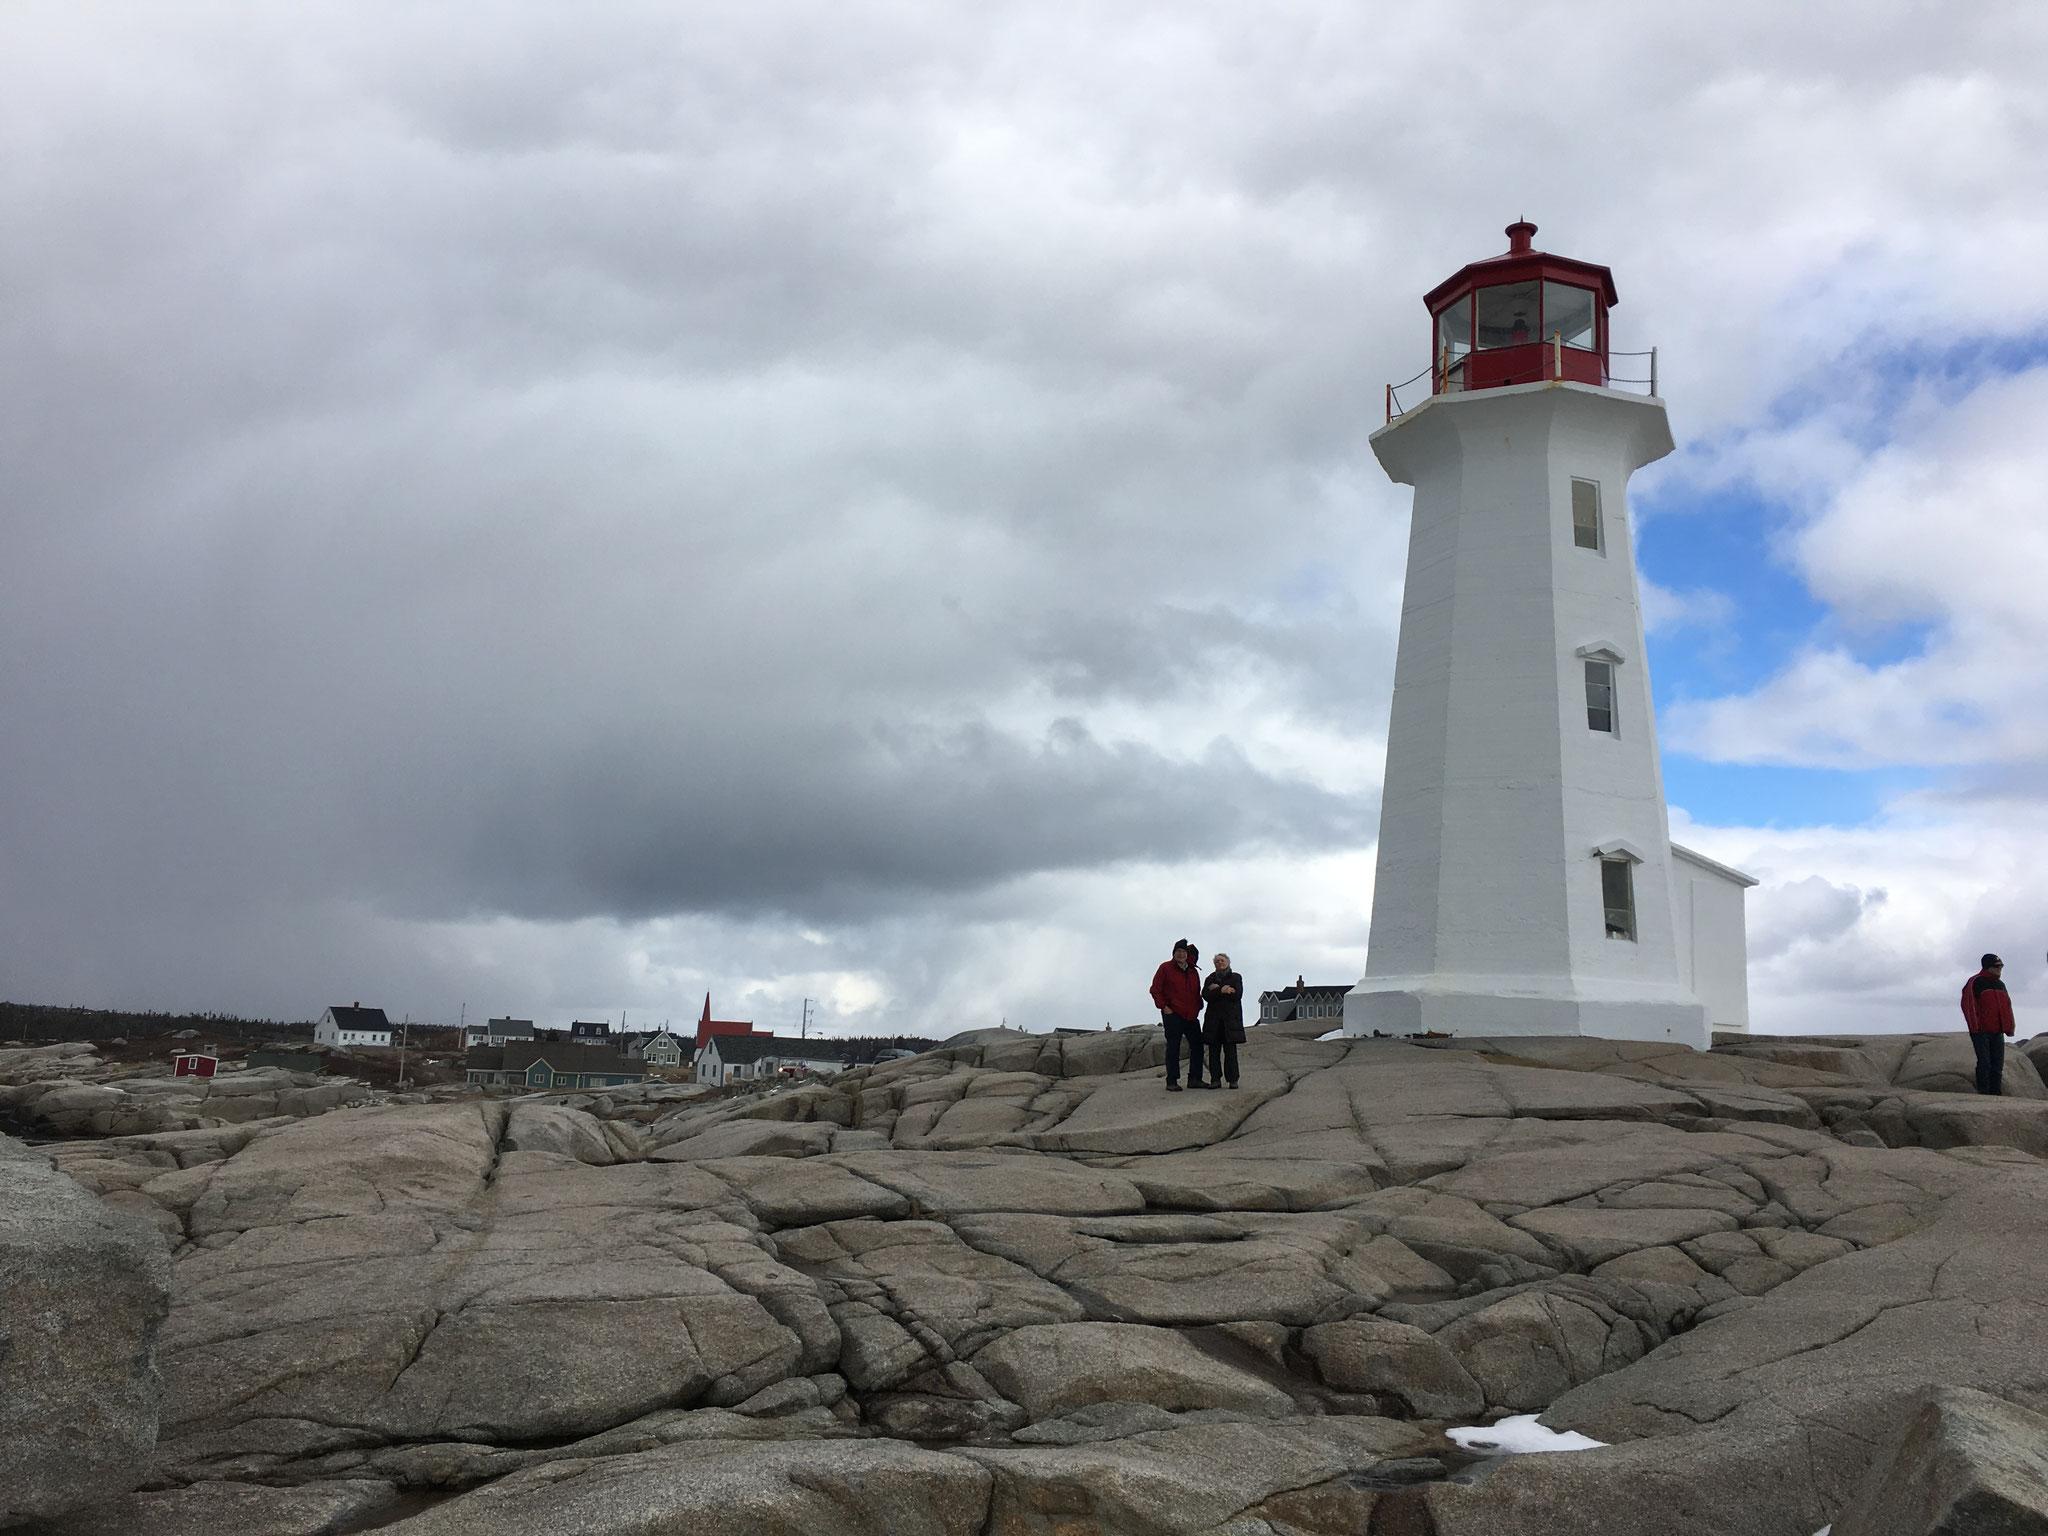 2018 Jenny's Cove, Nova Scotia, Canada  John Wagner & Susan Barner